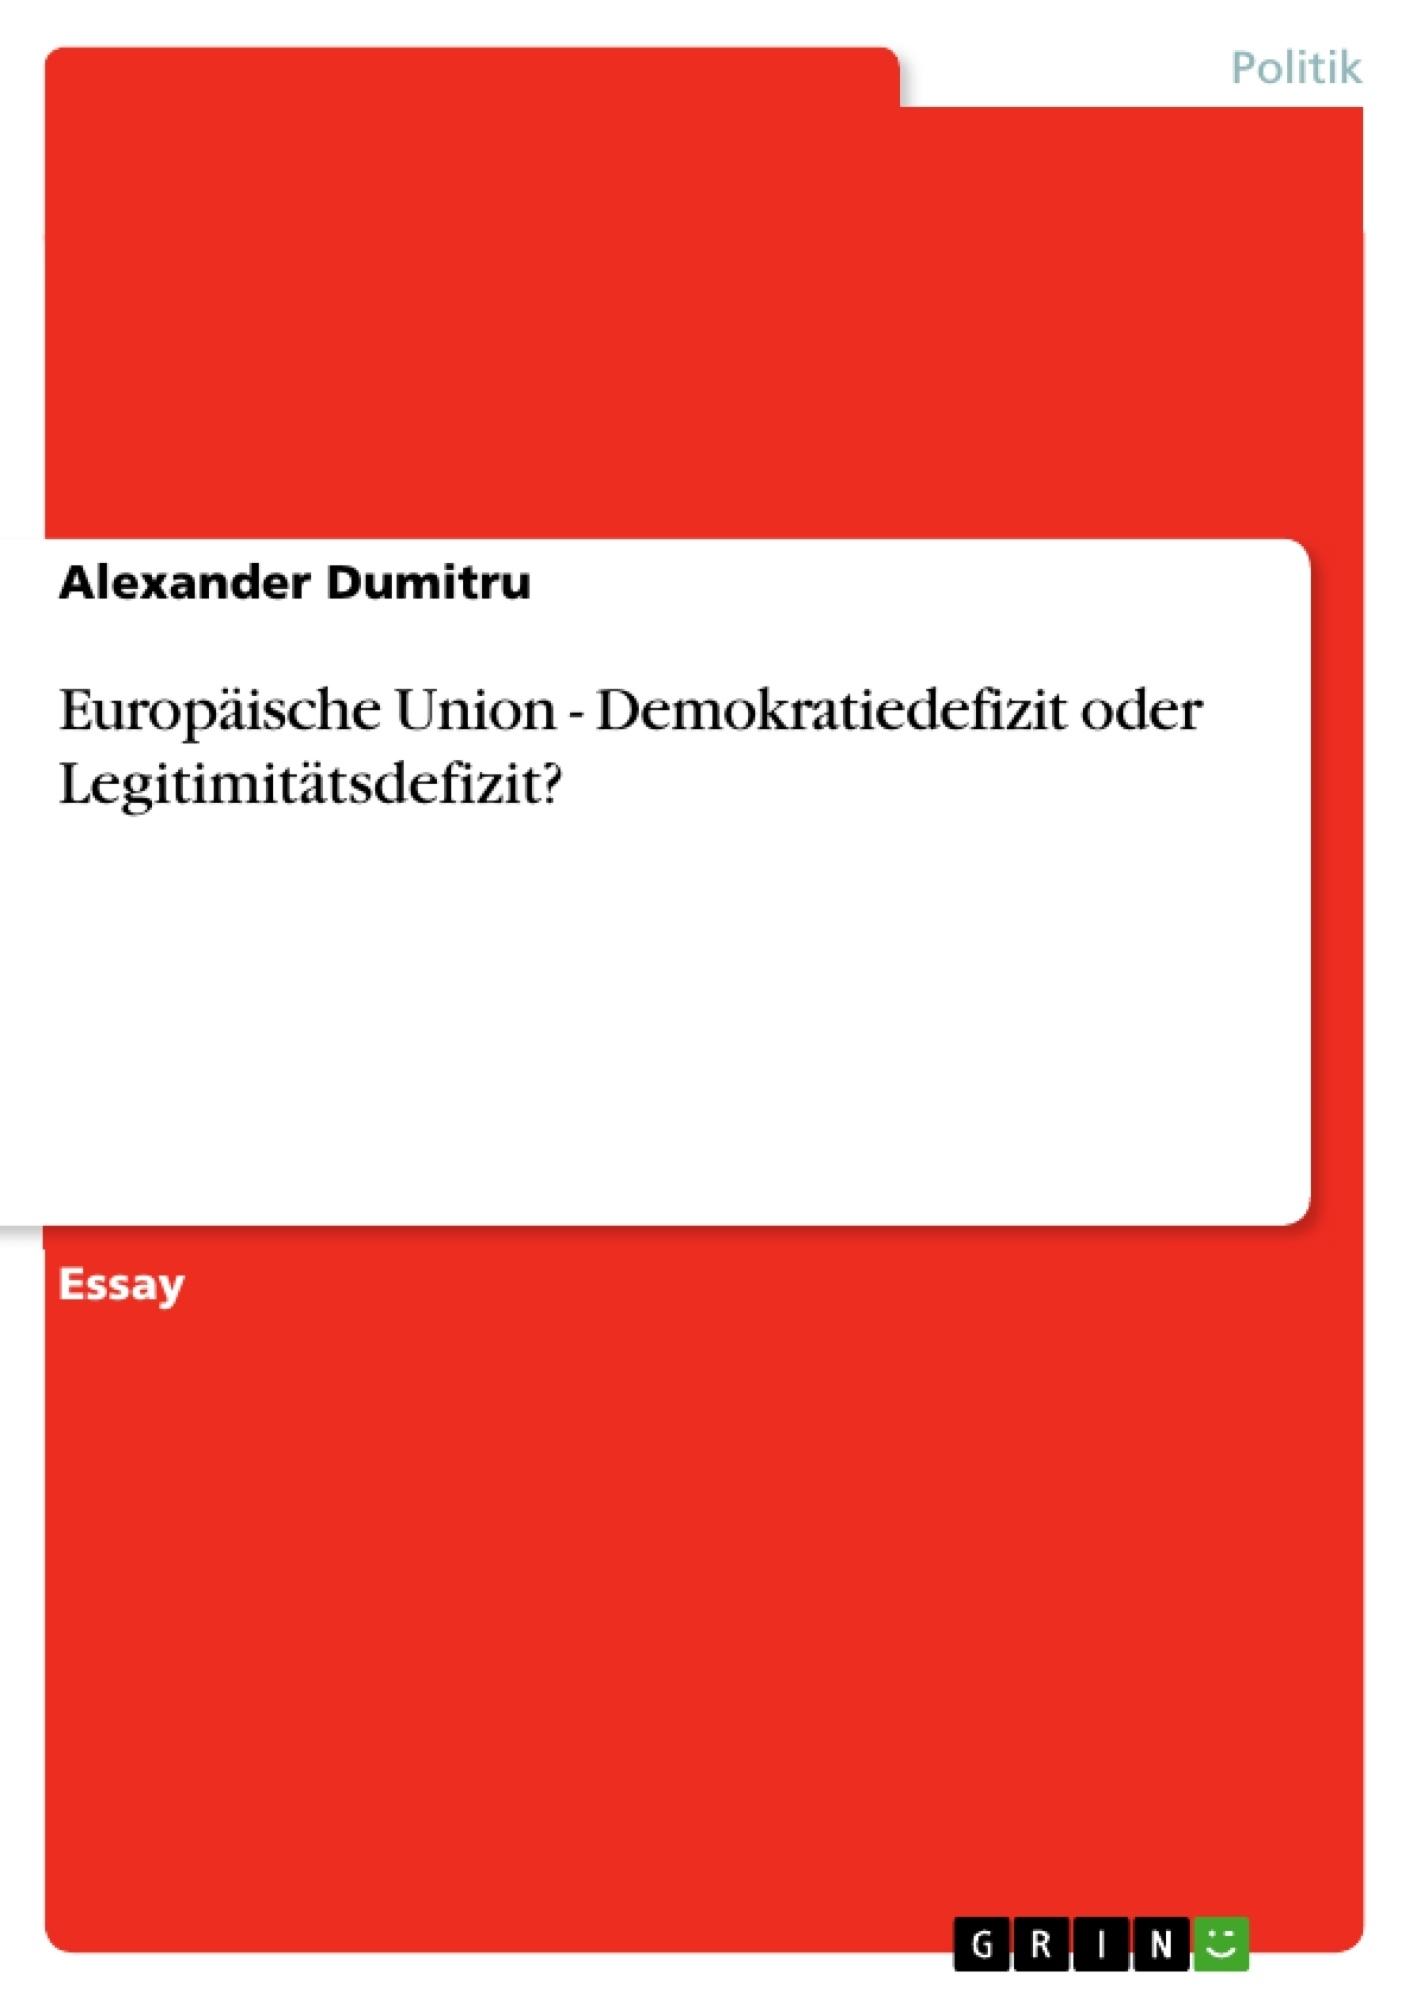 Titel: Europäische Union - Demokratiedefizit oder Legitimitätsdefizit?